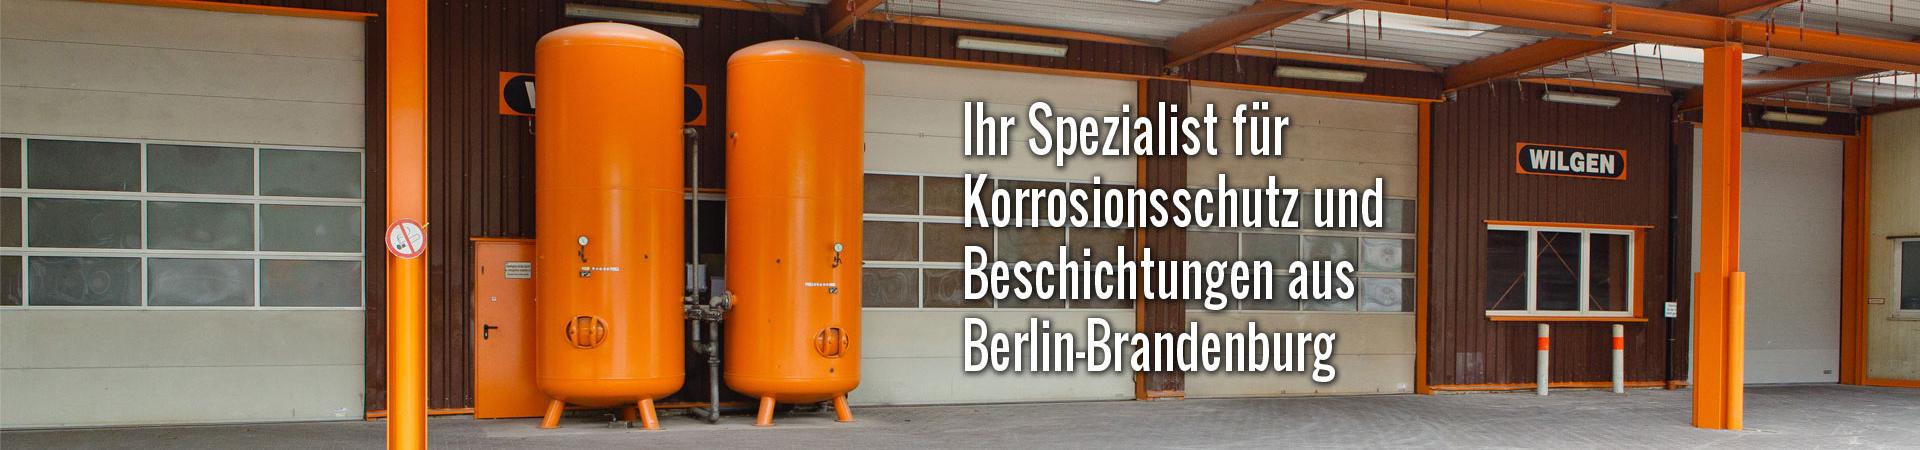 Wilgen Korrosionsschutz Berlin-Brandenburg